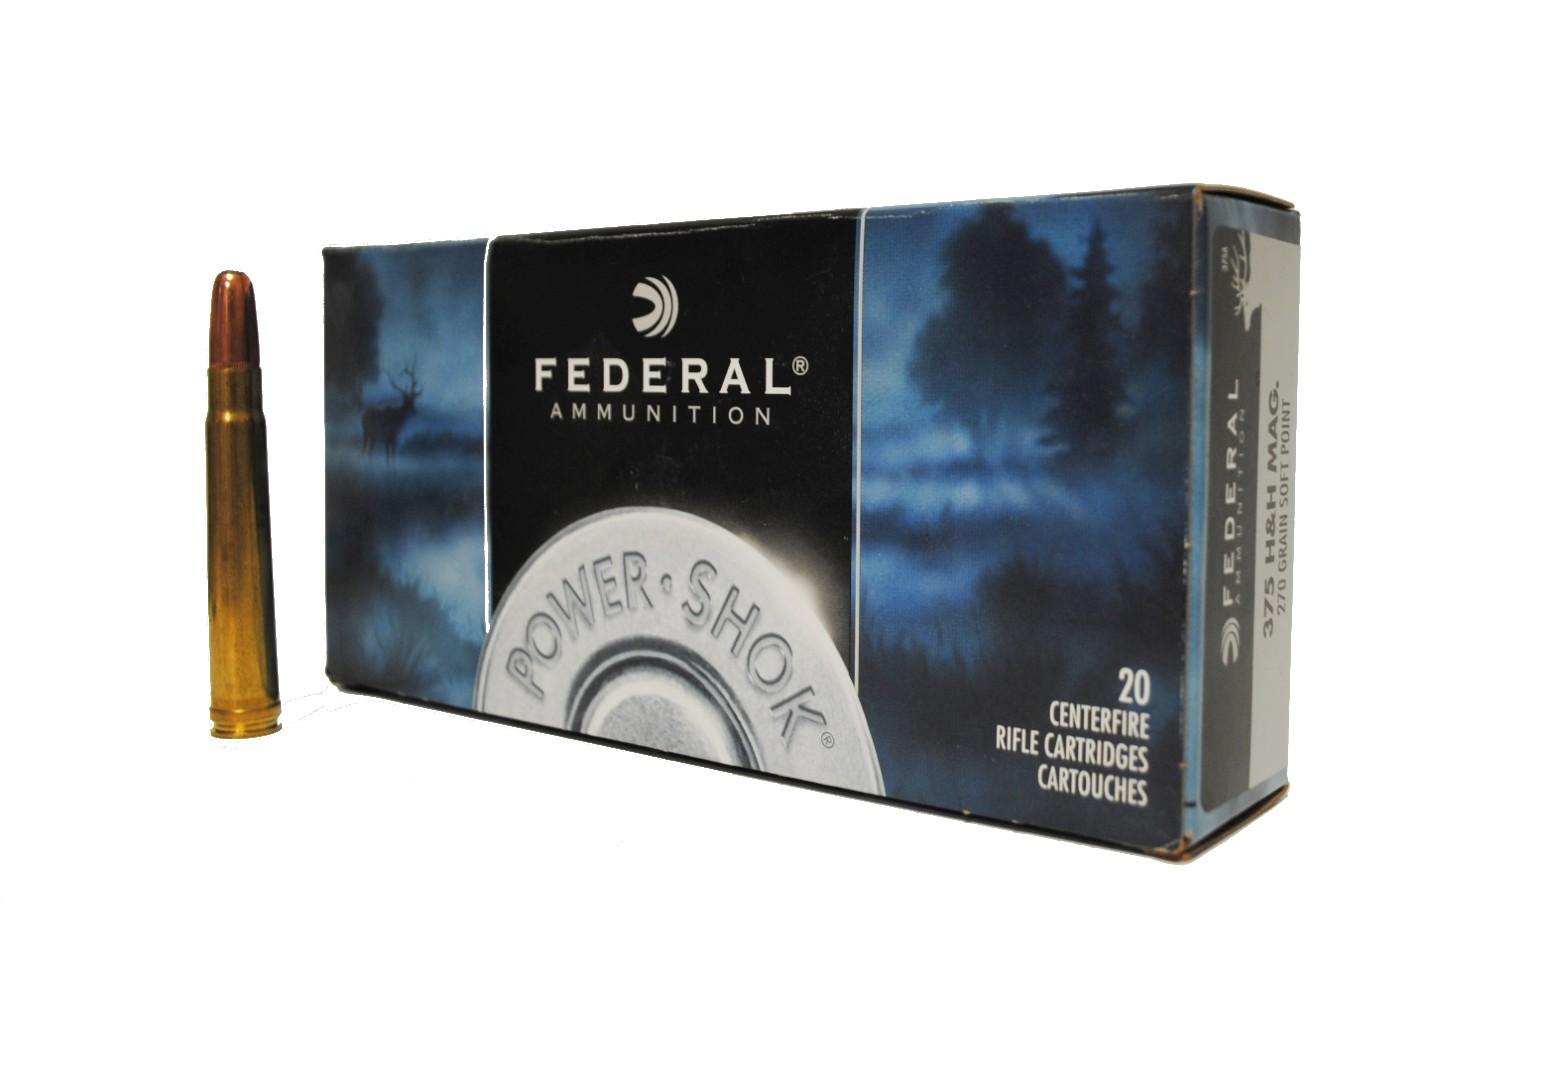 Boite de 20 cartouches FEDERAL SP calibre 375 HH  270 GRS F375A